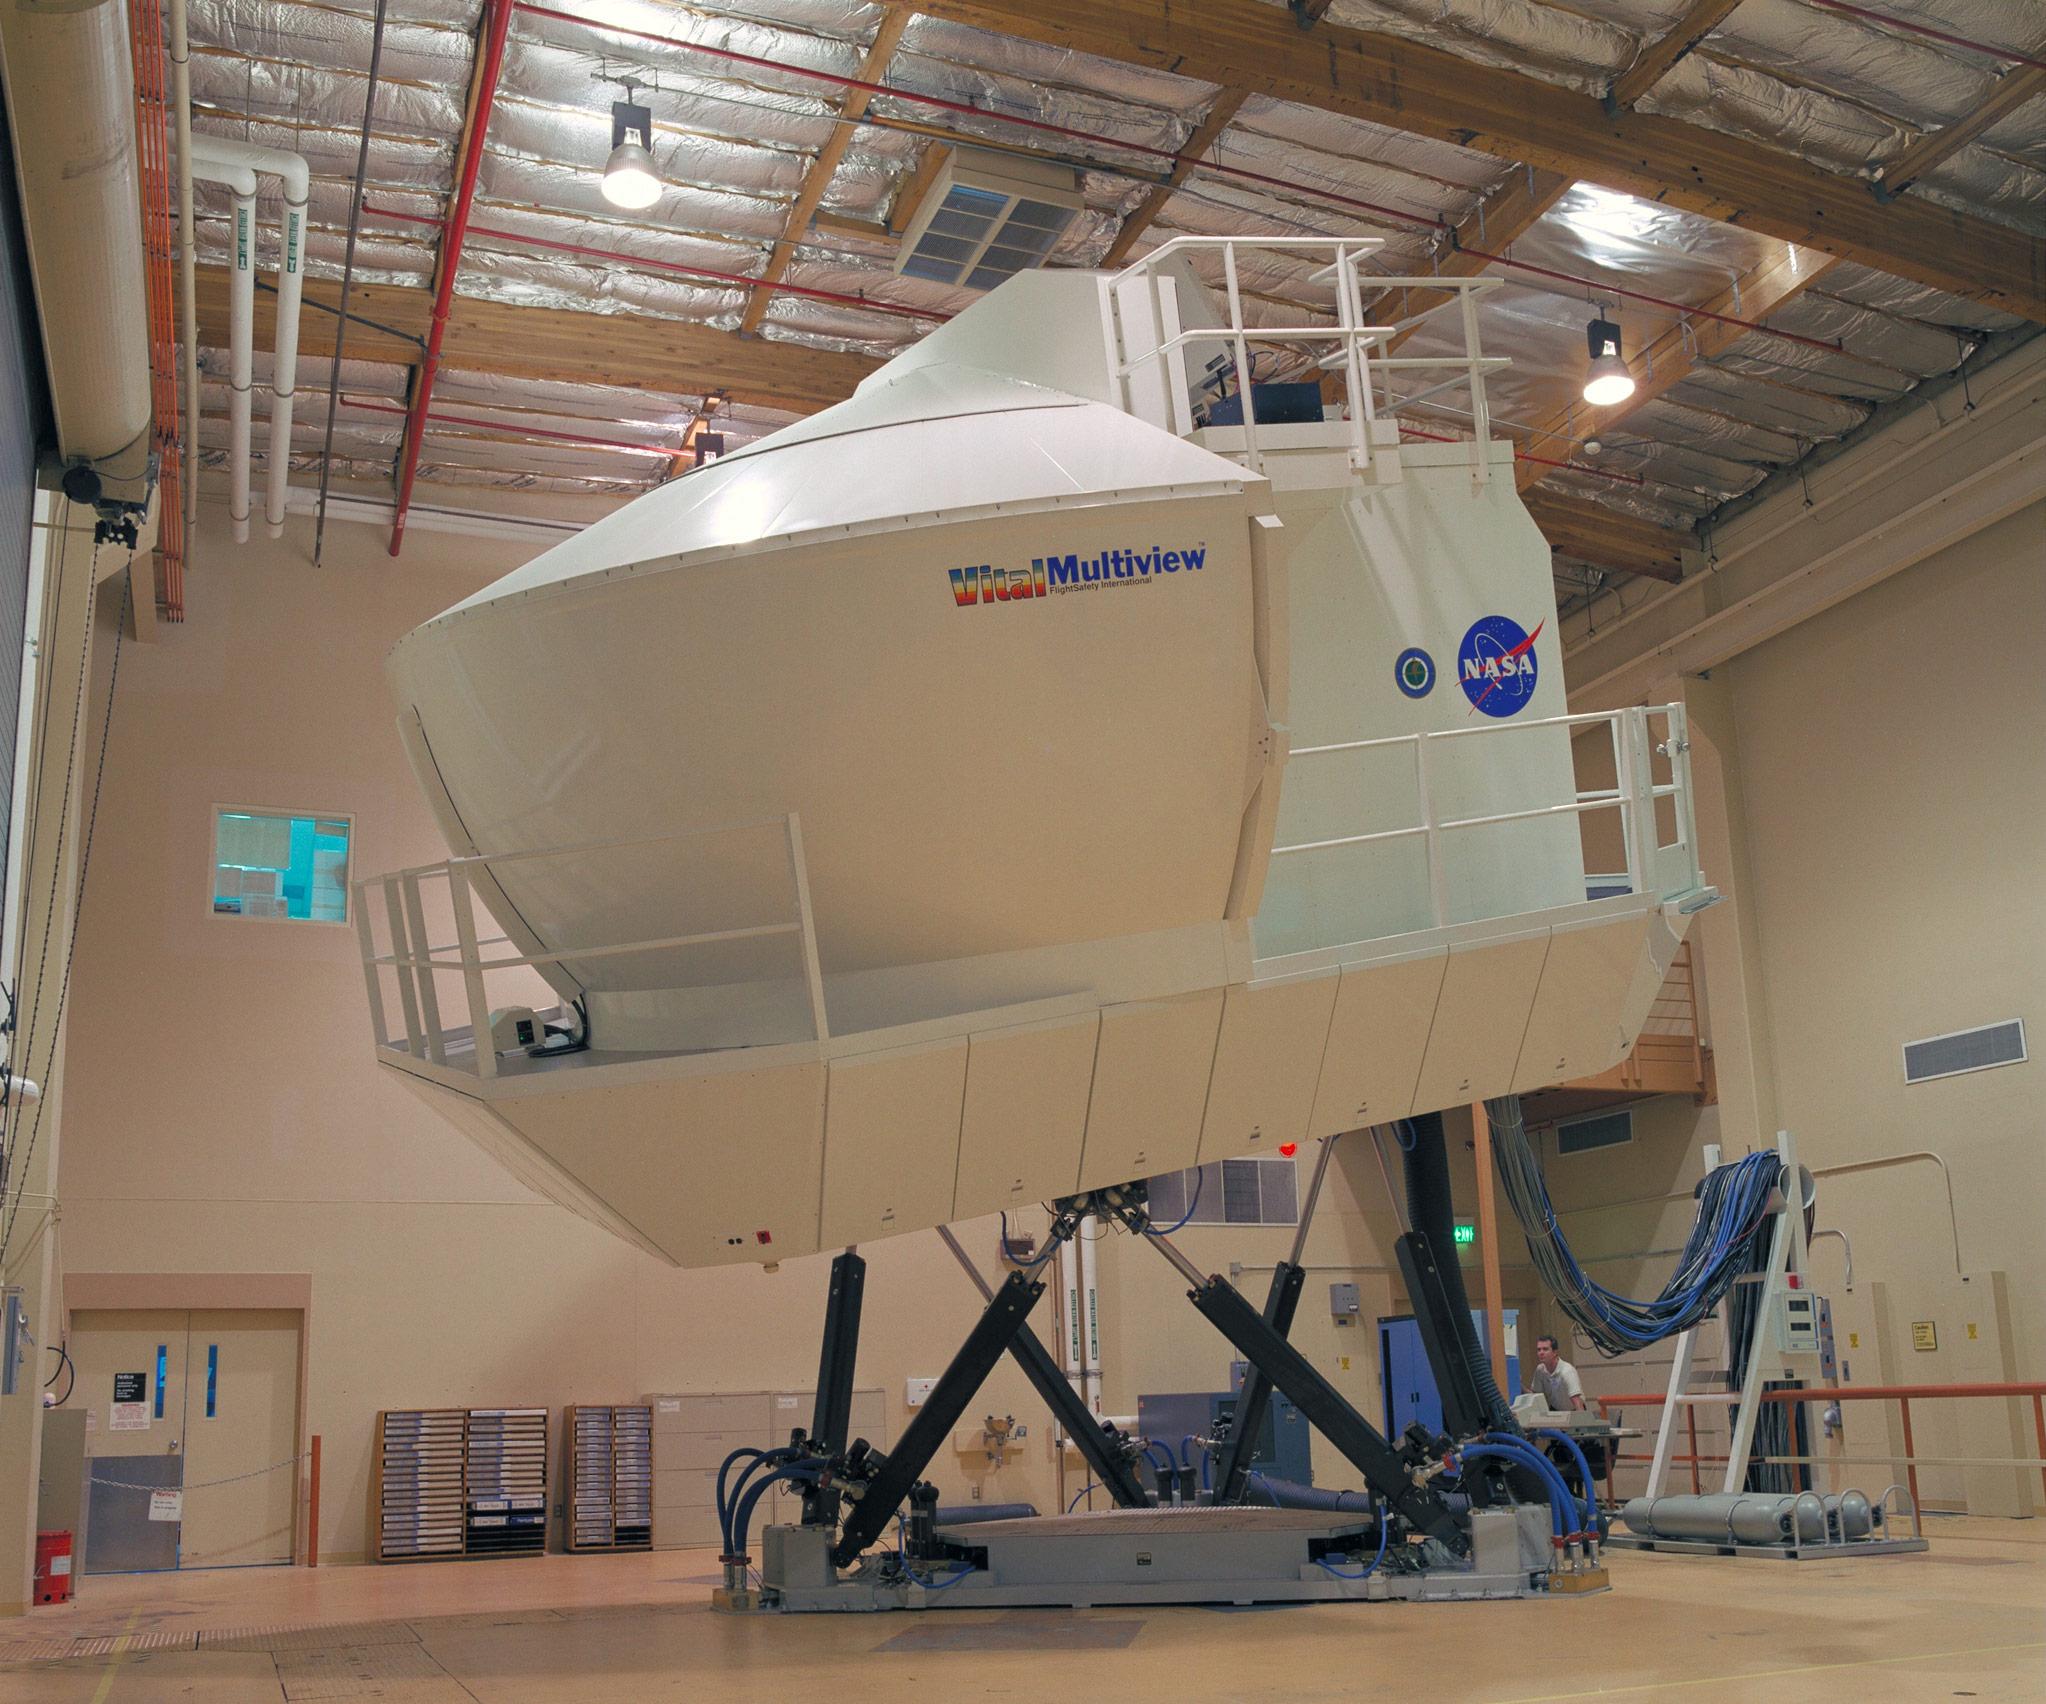 astronaut flight simulator - photo #4